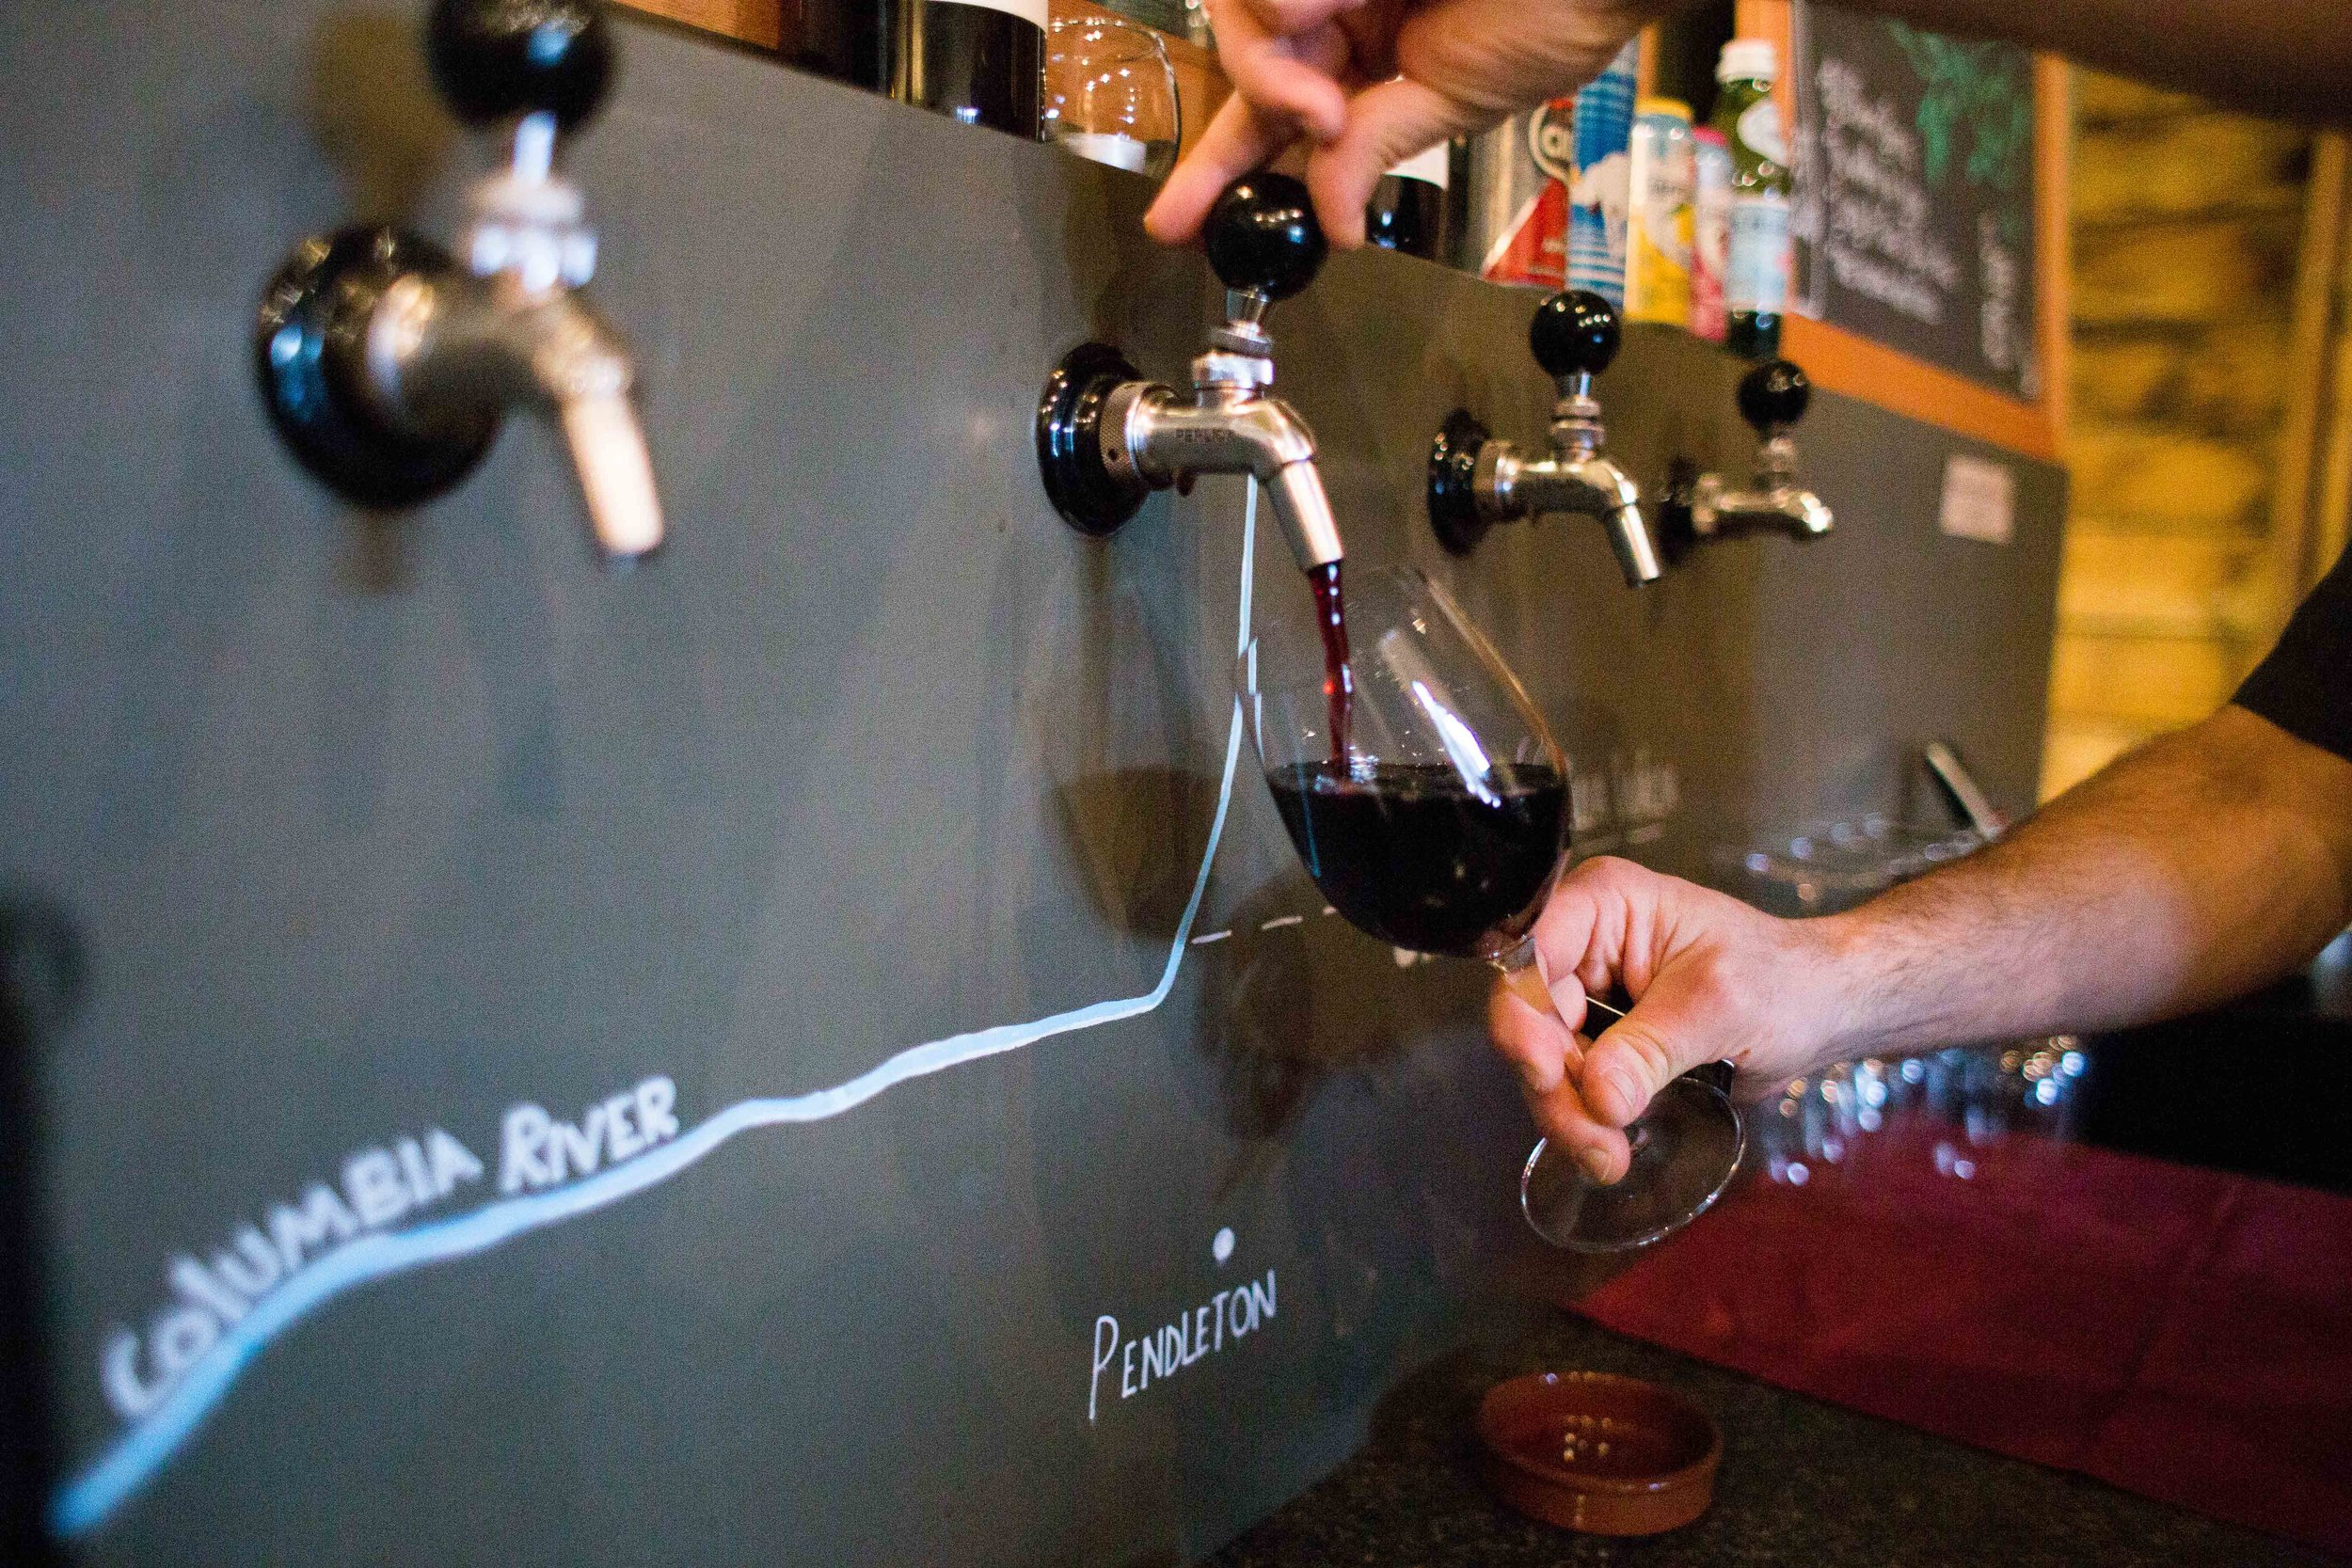 Hood River Wine Alliance Wine Walk Columbia Gorge Downtown Tasting Rooms Wineries Drink Taste Explore Columbia Gorge Oregon Washington-43.jpg